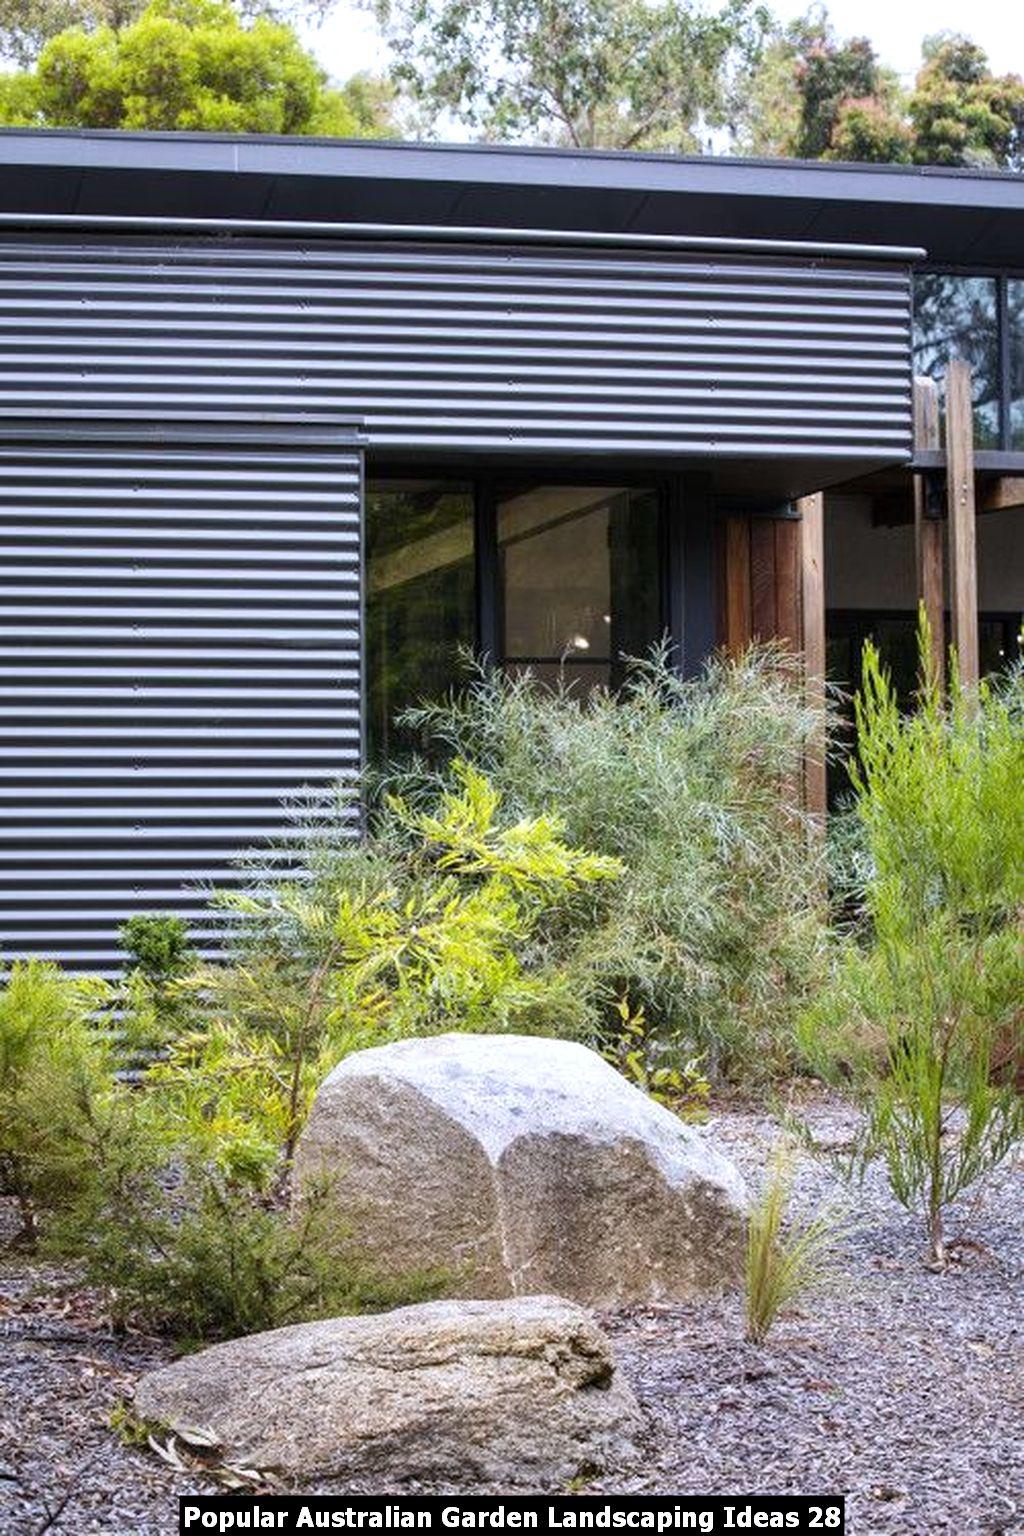 Popular Australian Garden Landscaping Ideas 28